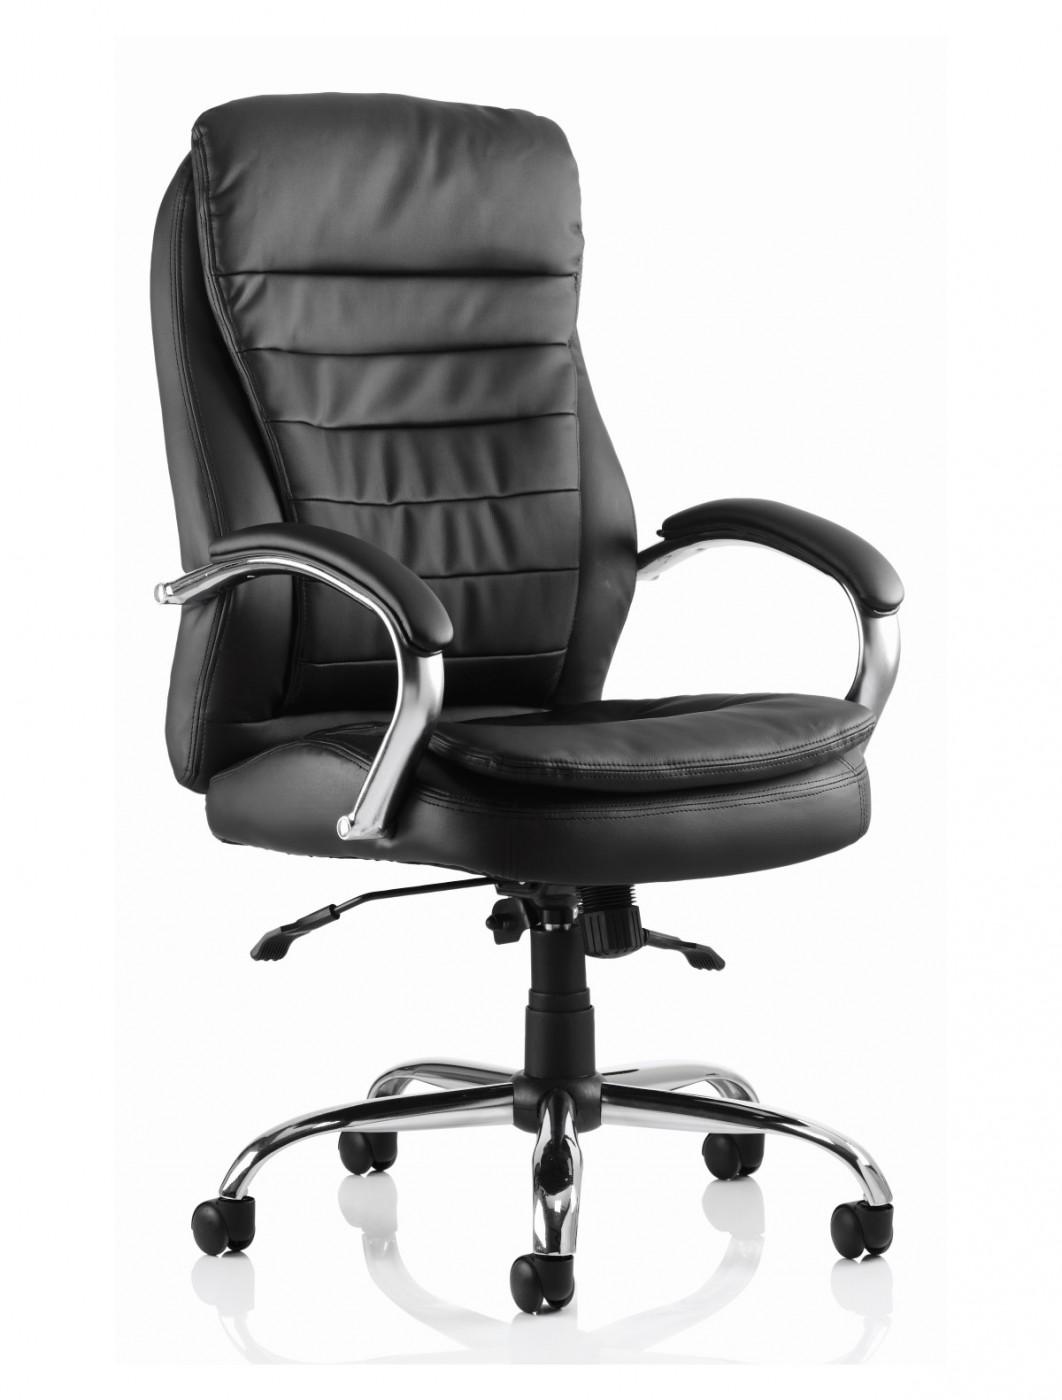 Rocky Heavy Duty Executive Leather Chair